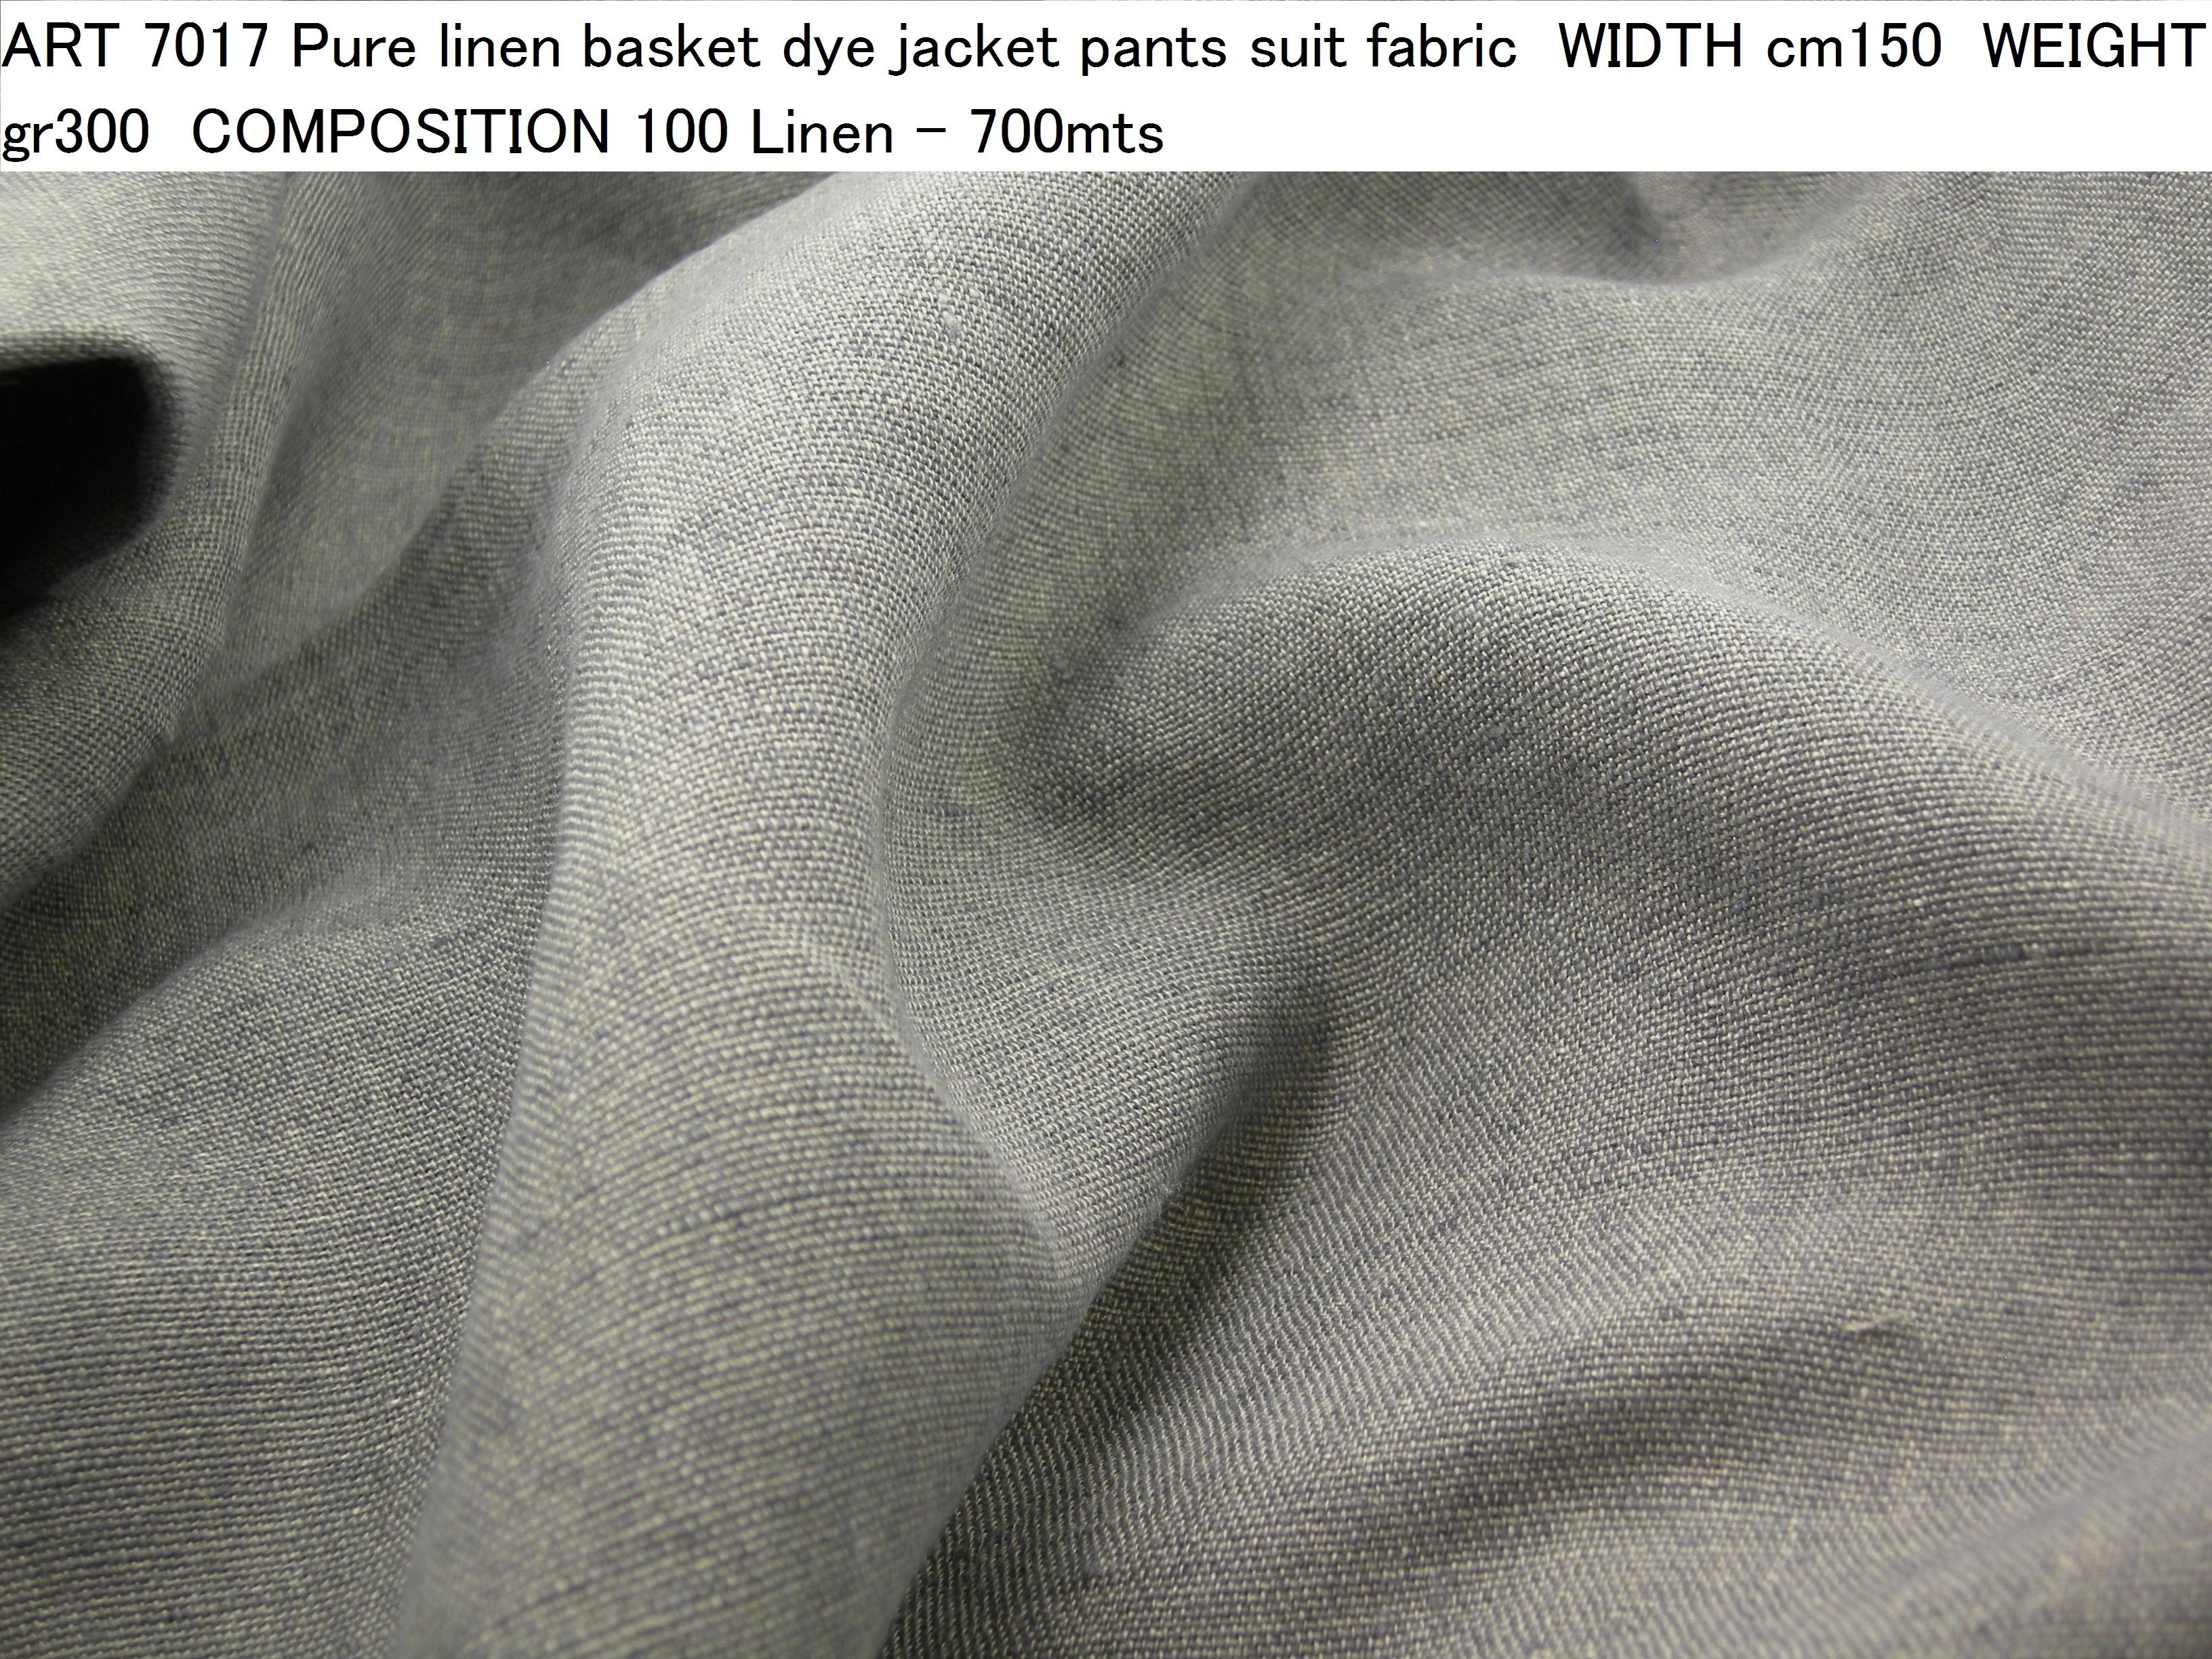 ART 7017 Pure linen basket dye jacket pants suit fabric WIDTH cm150 WEIGHT gr300 COMPOSITION 100 Linen - 700mts